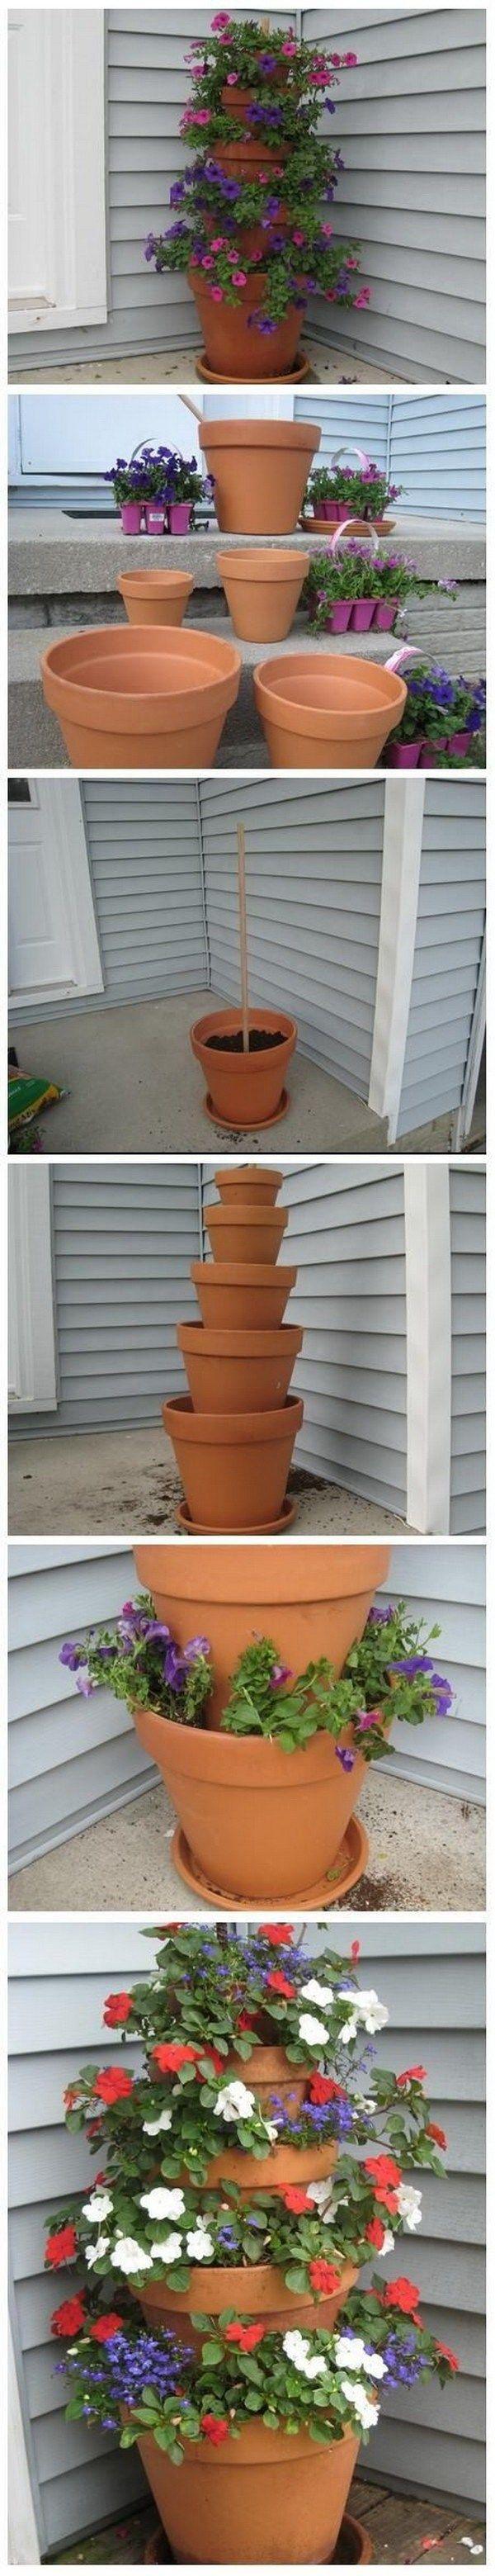 31 best Spilled Flower Pot Ideas images